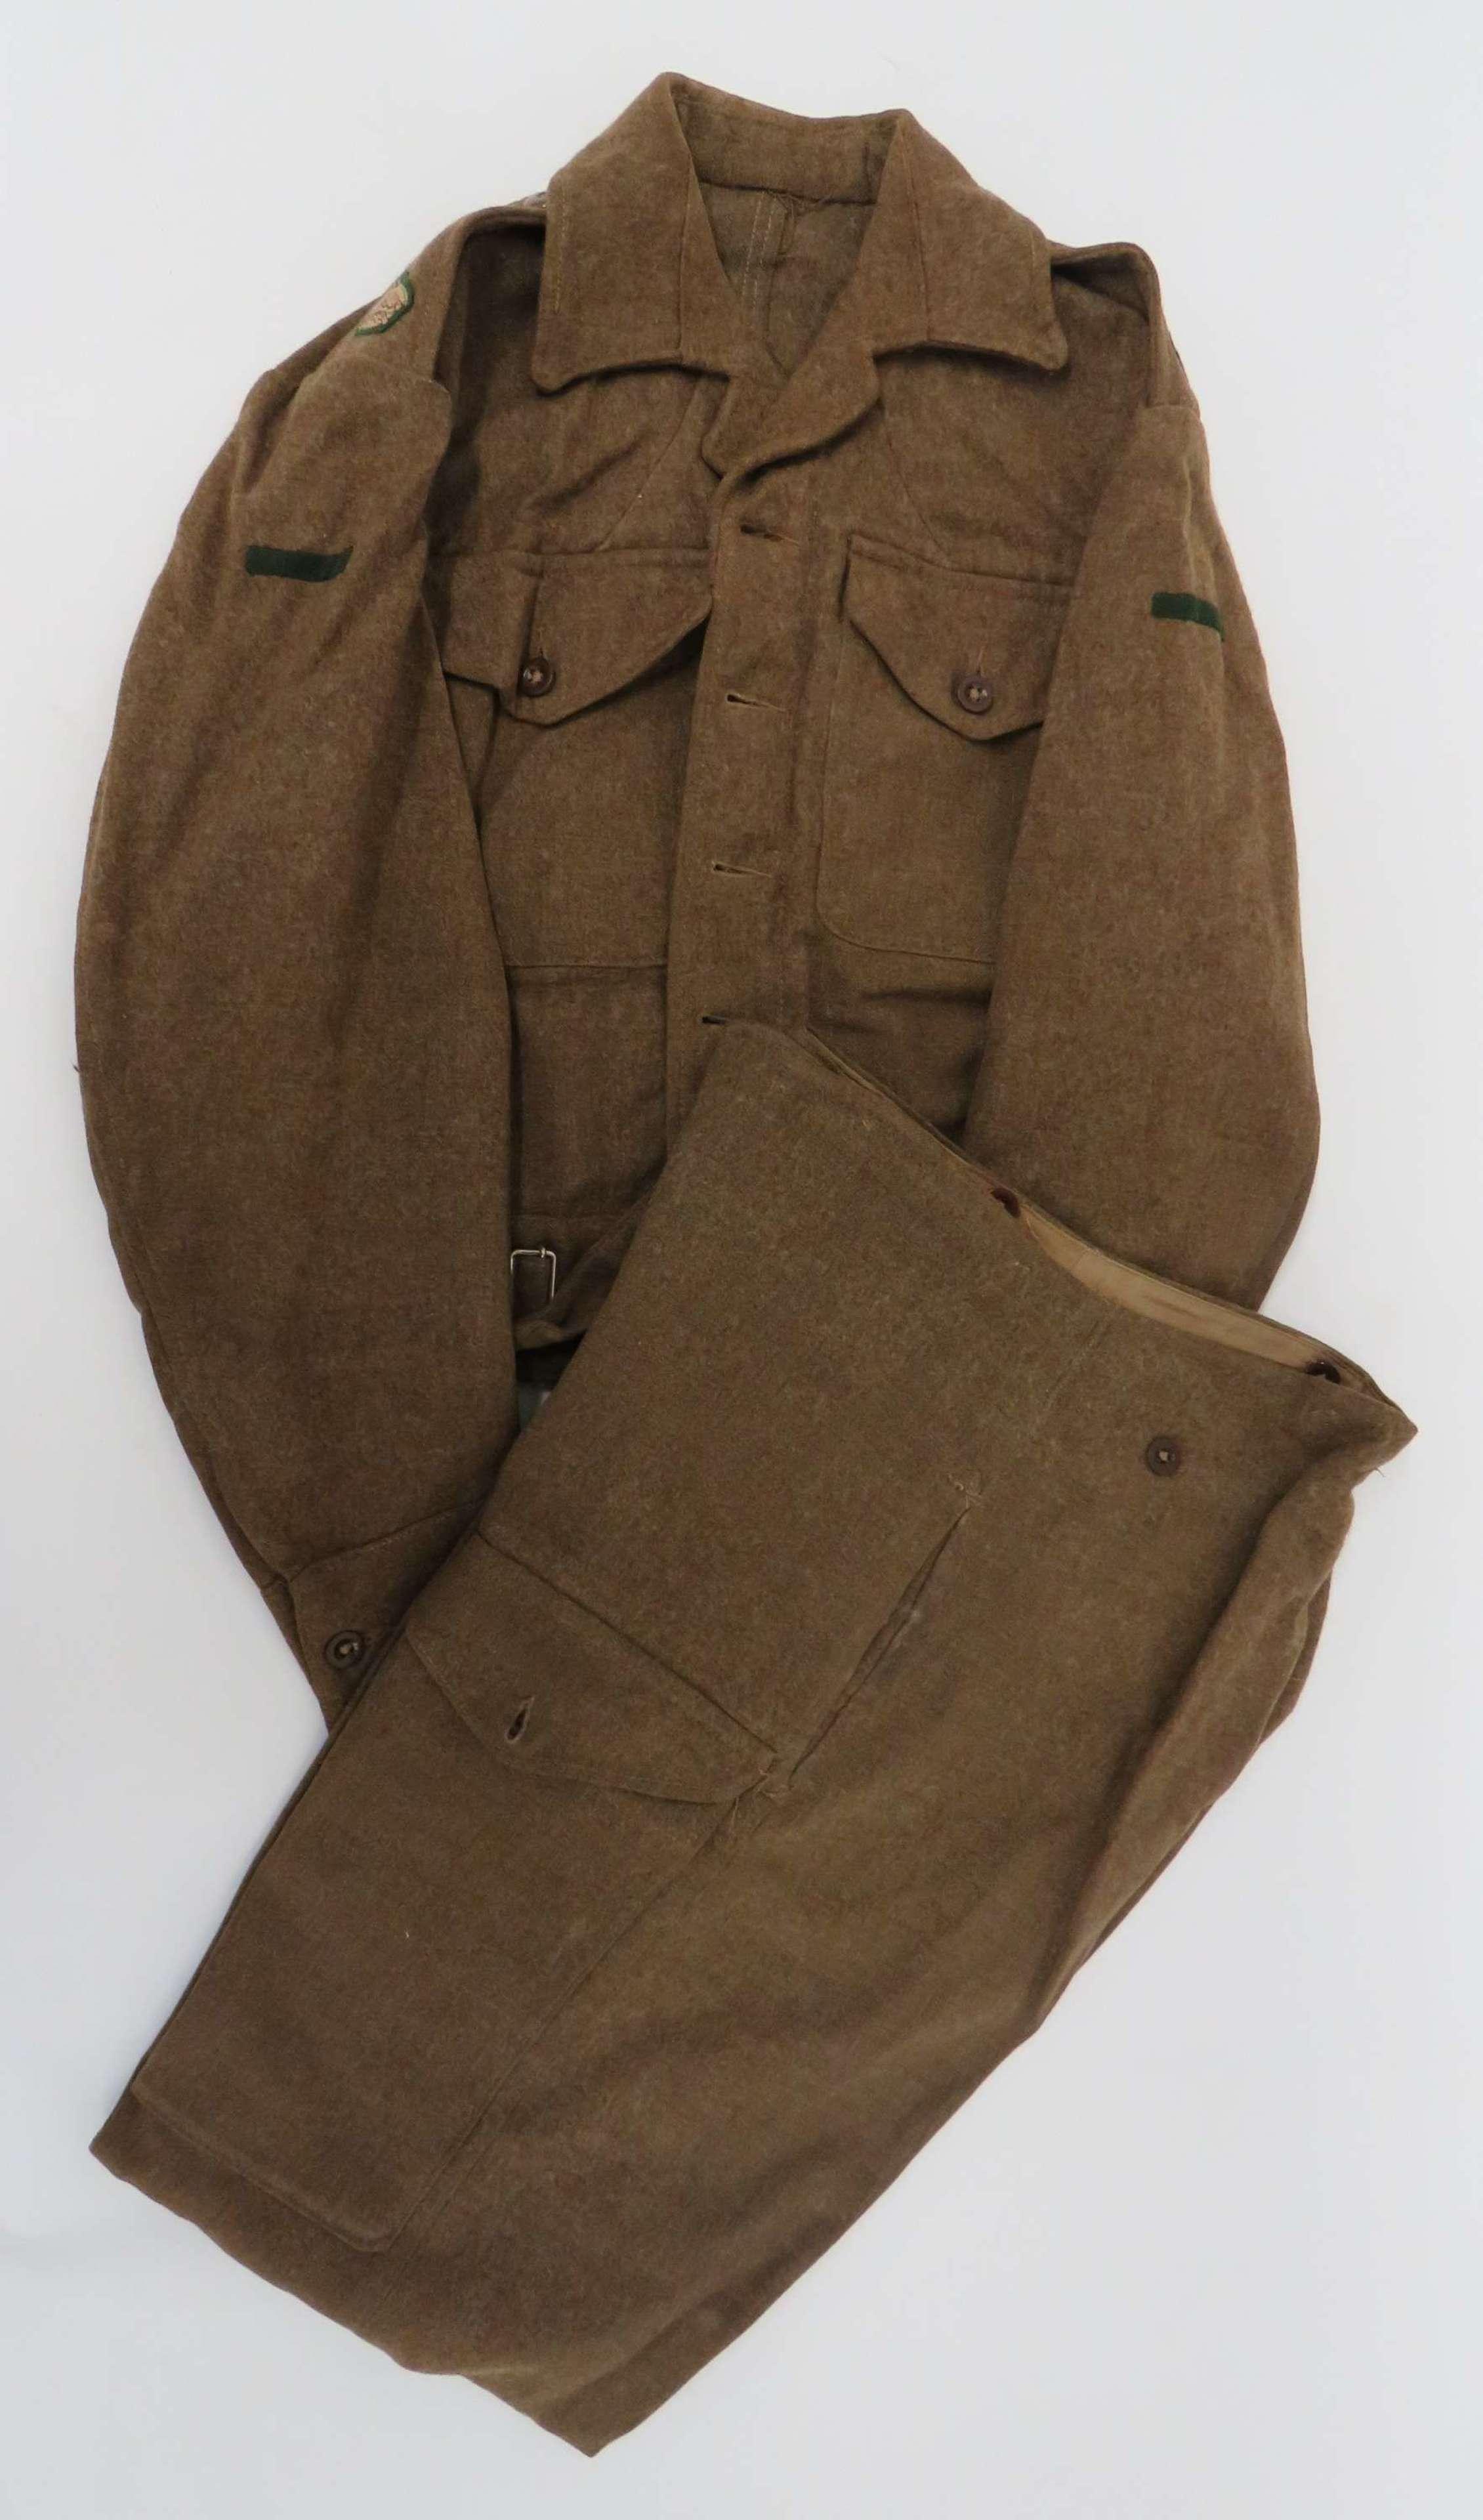 1940 Pattern Intelligence Corps Battledress Jacket and Trousers